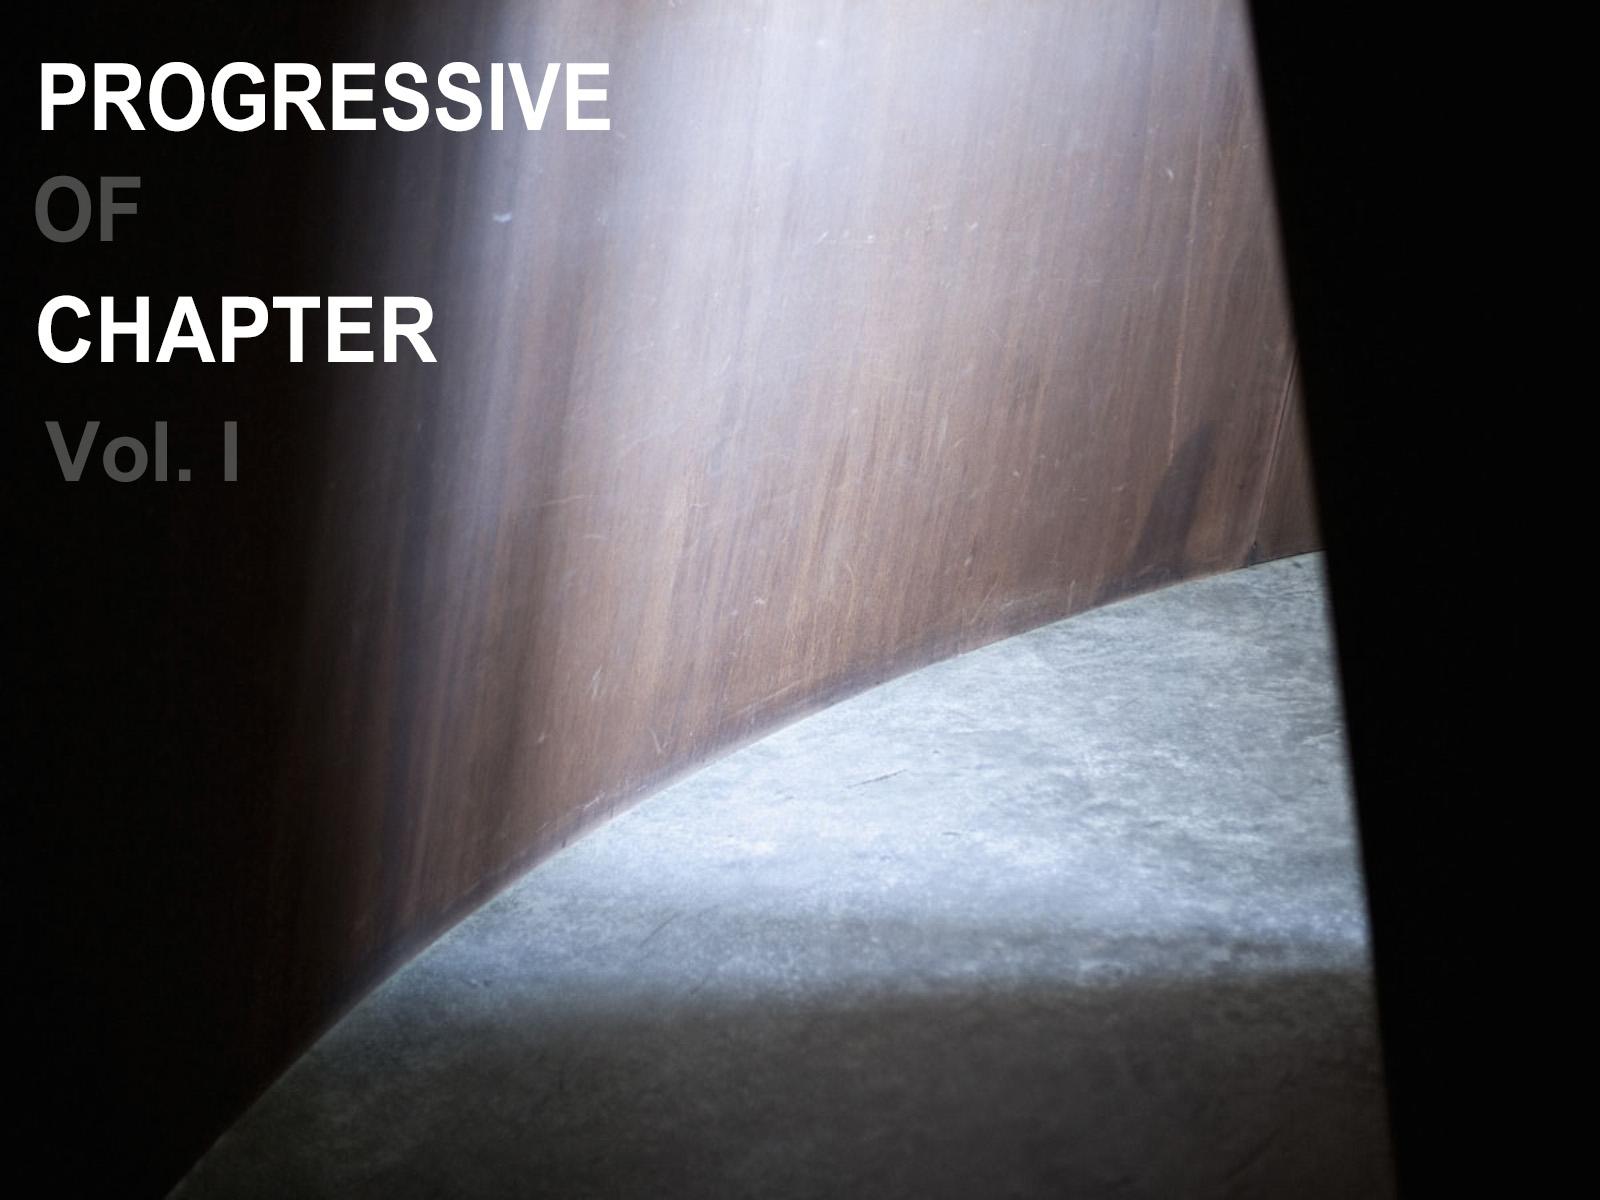 PROGRESSIVE OF CHAPTER Vol. I